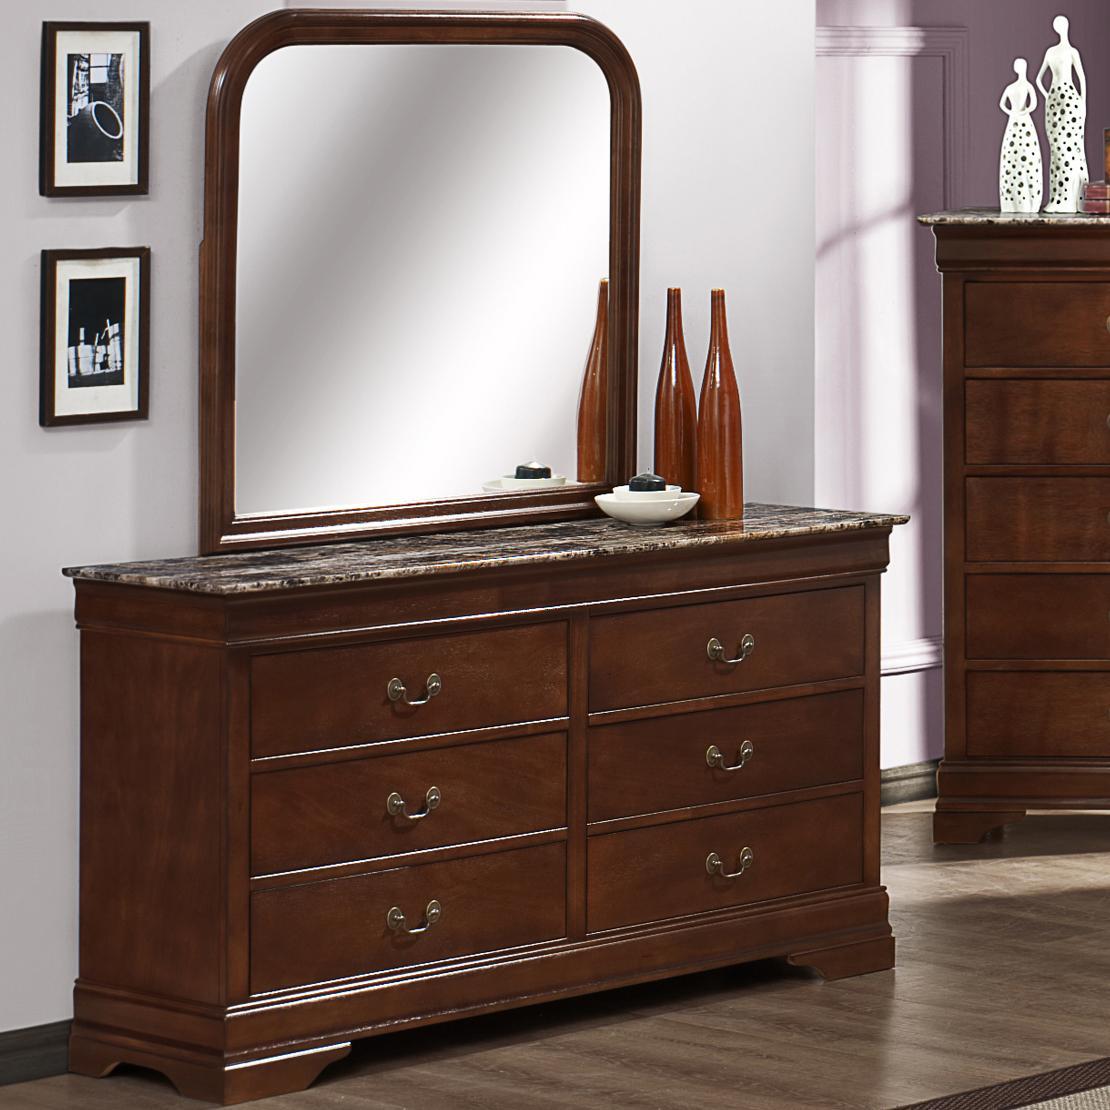 Austin Group Marseille Dresser and Mirror - Item Number: 329M-10-CHR+329-01-CHR